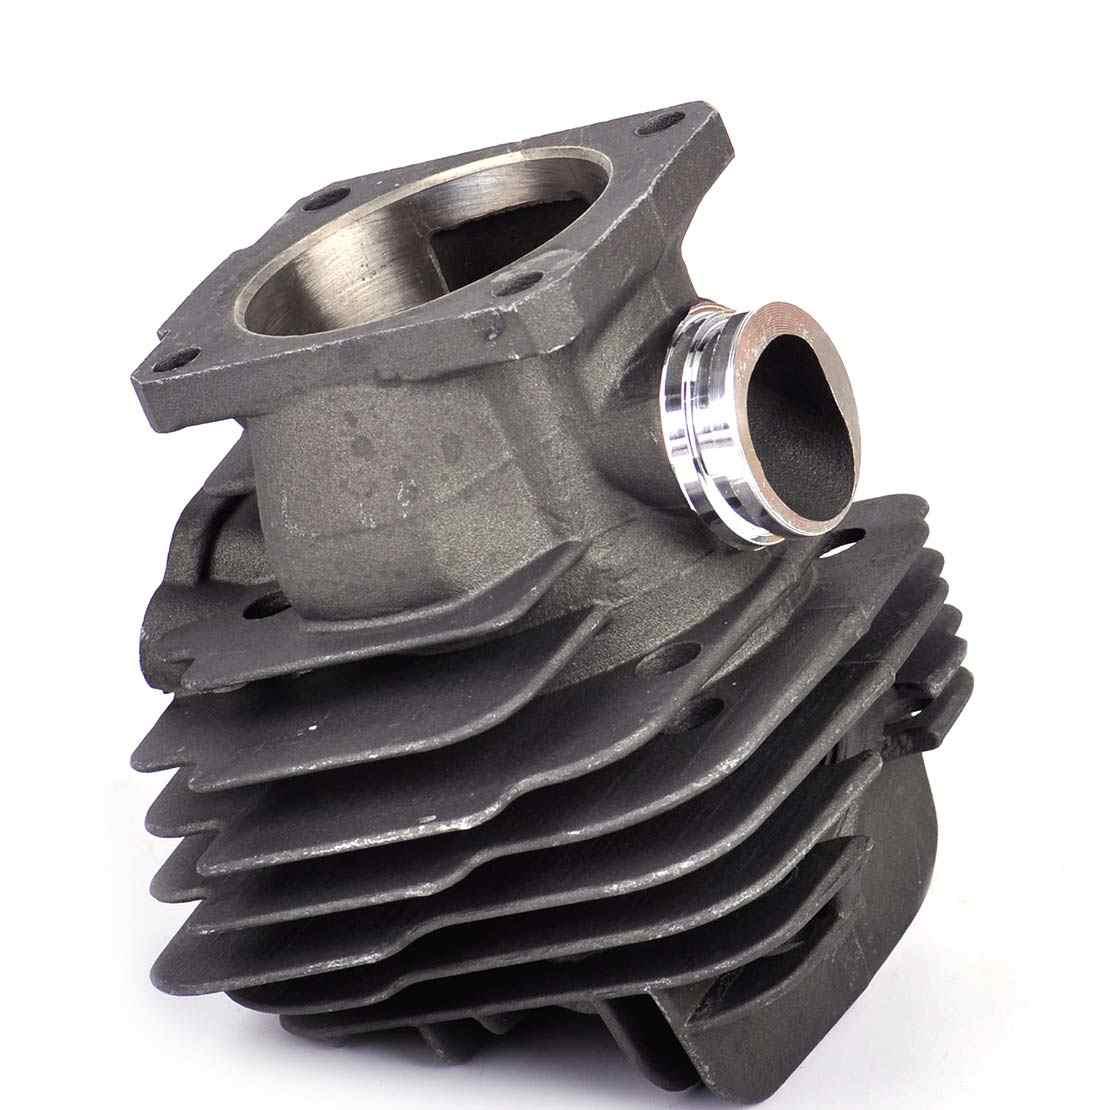 LETAOSK 44 MM צילינדר טבעת הבוכנה ערכת Fit לstihl 026 MS260 Chainsaw 1121 020 1217